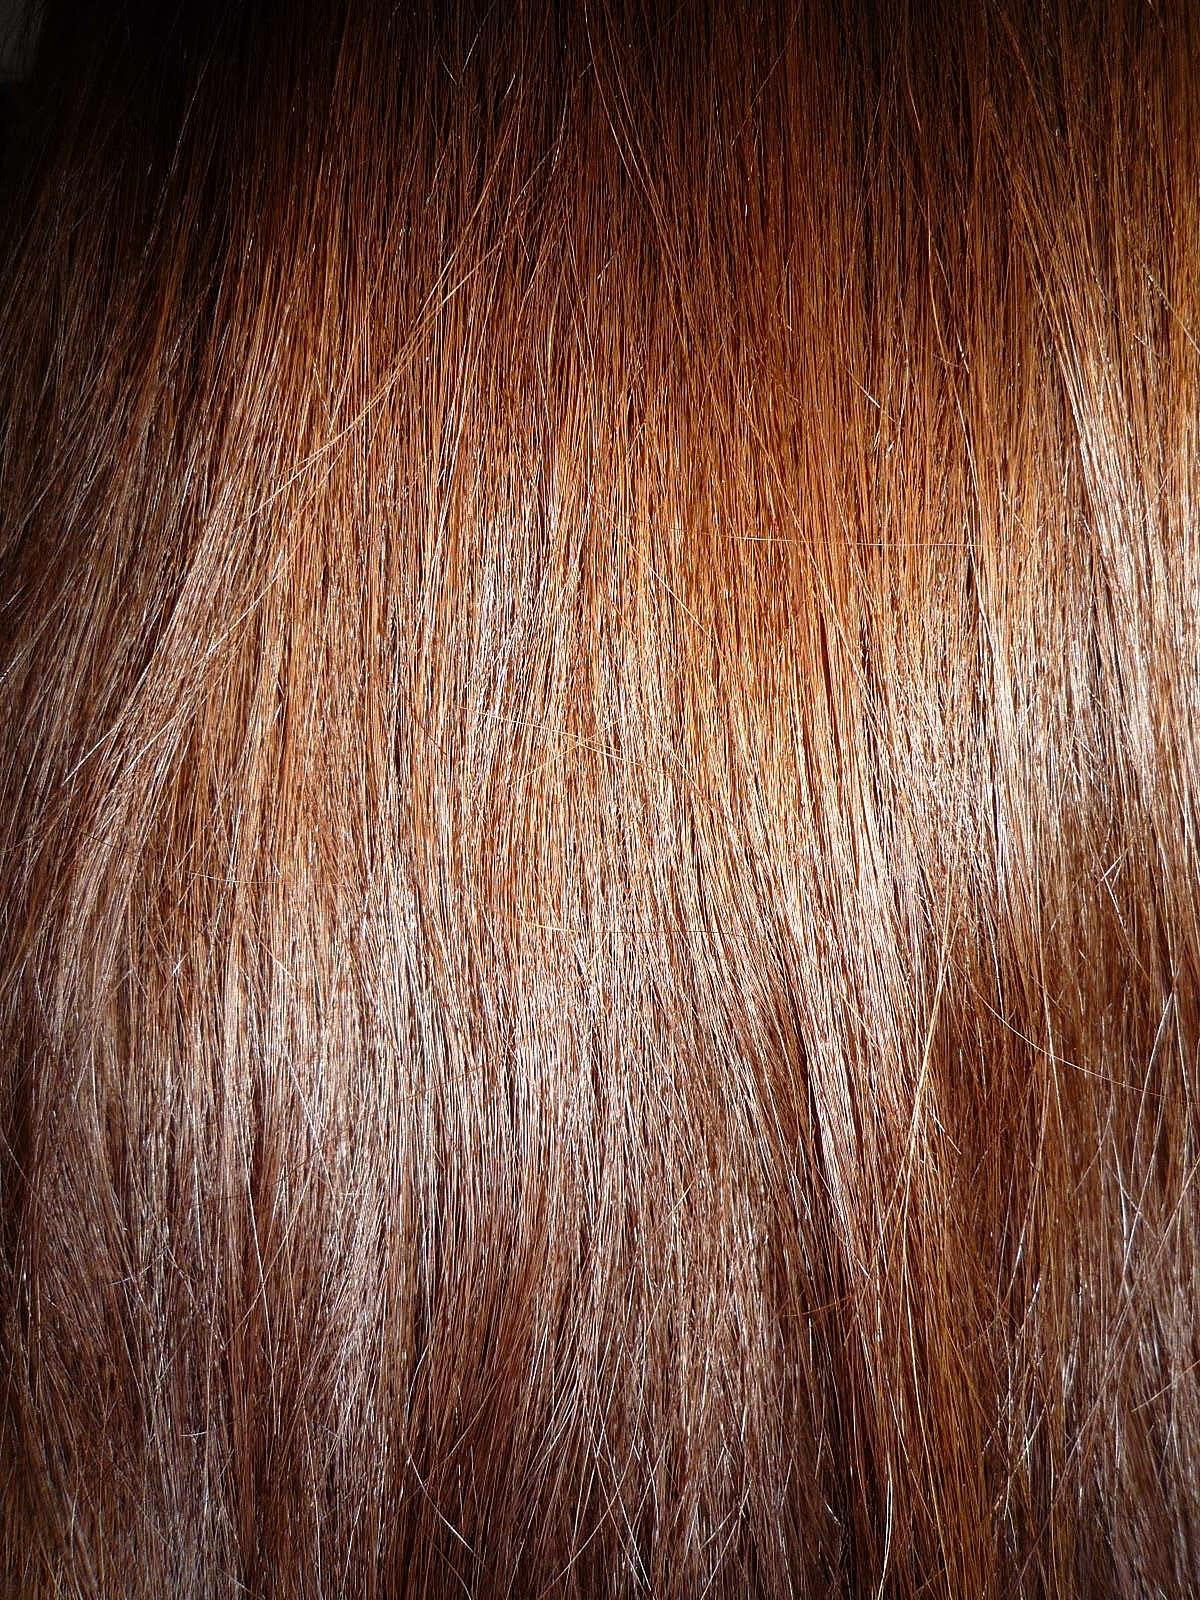 Brown Hair Wikipedia